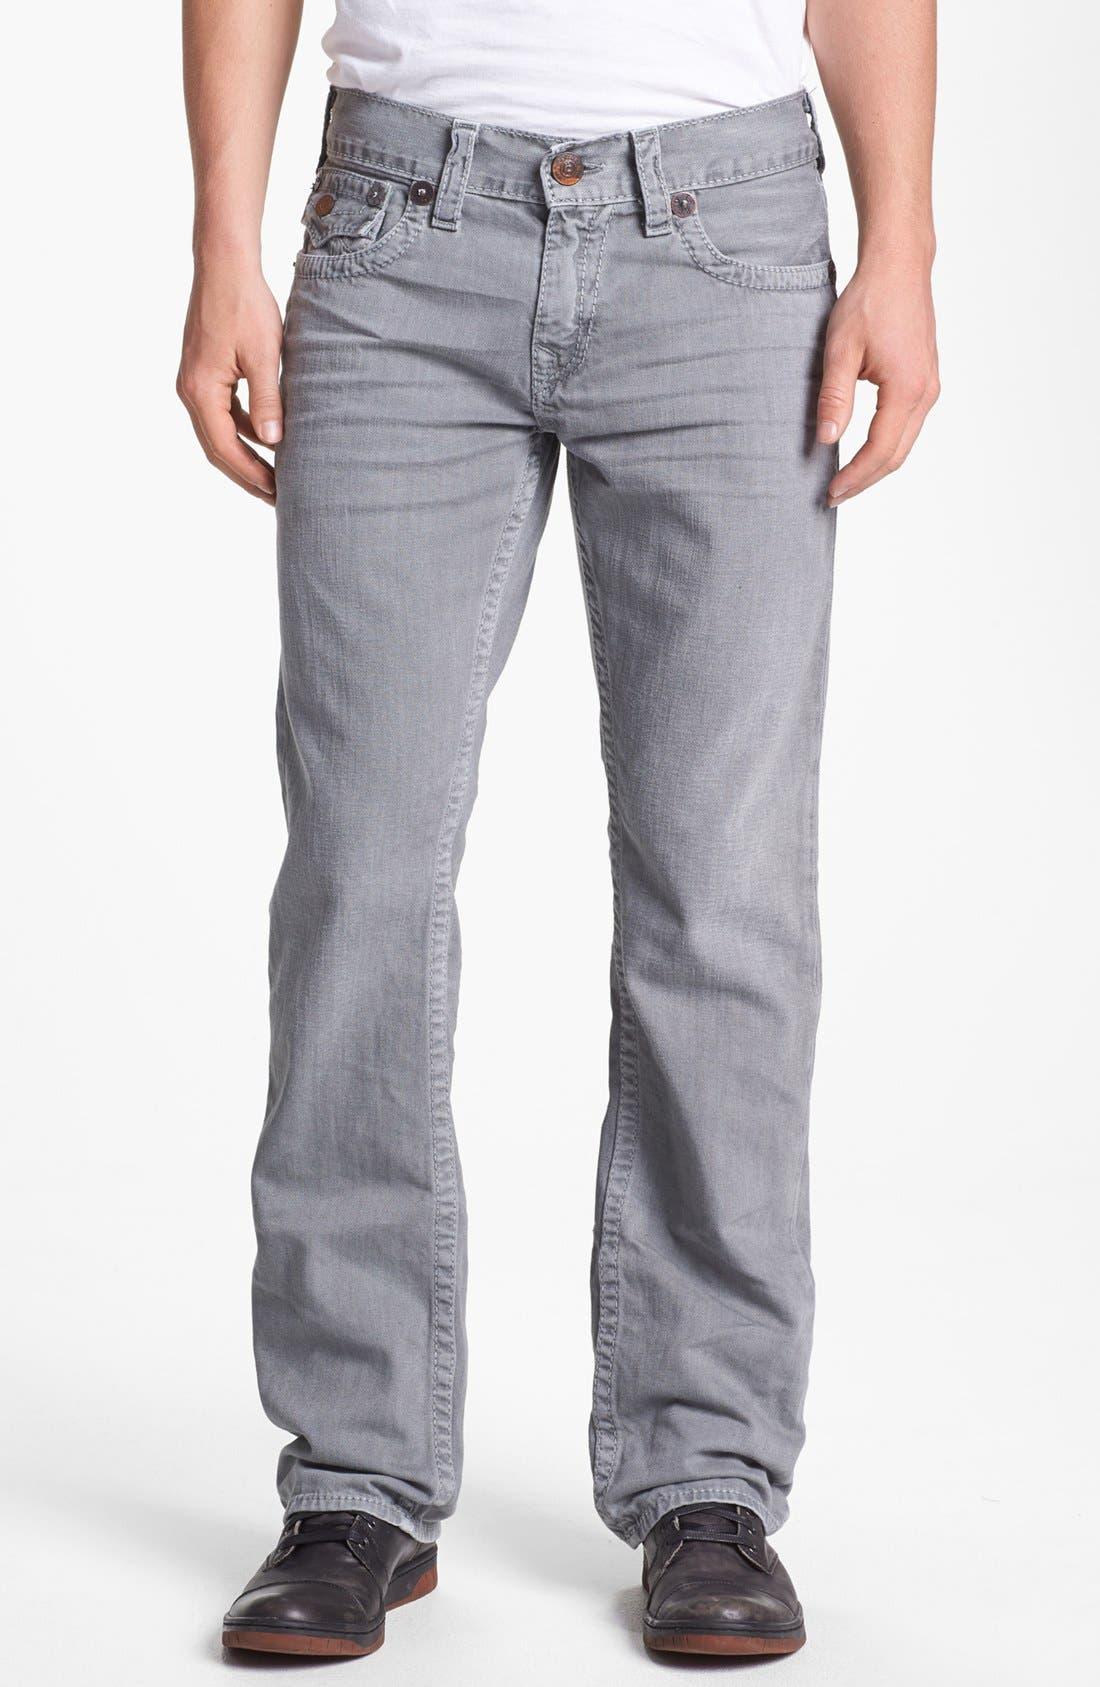 Alternate Image 2  - True Religion Brand Jeans 'Ricky' Straight Leg Jeans (Assd Seal)